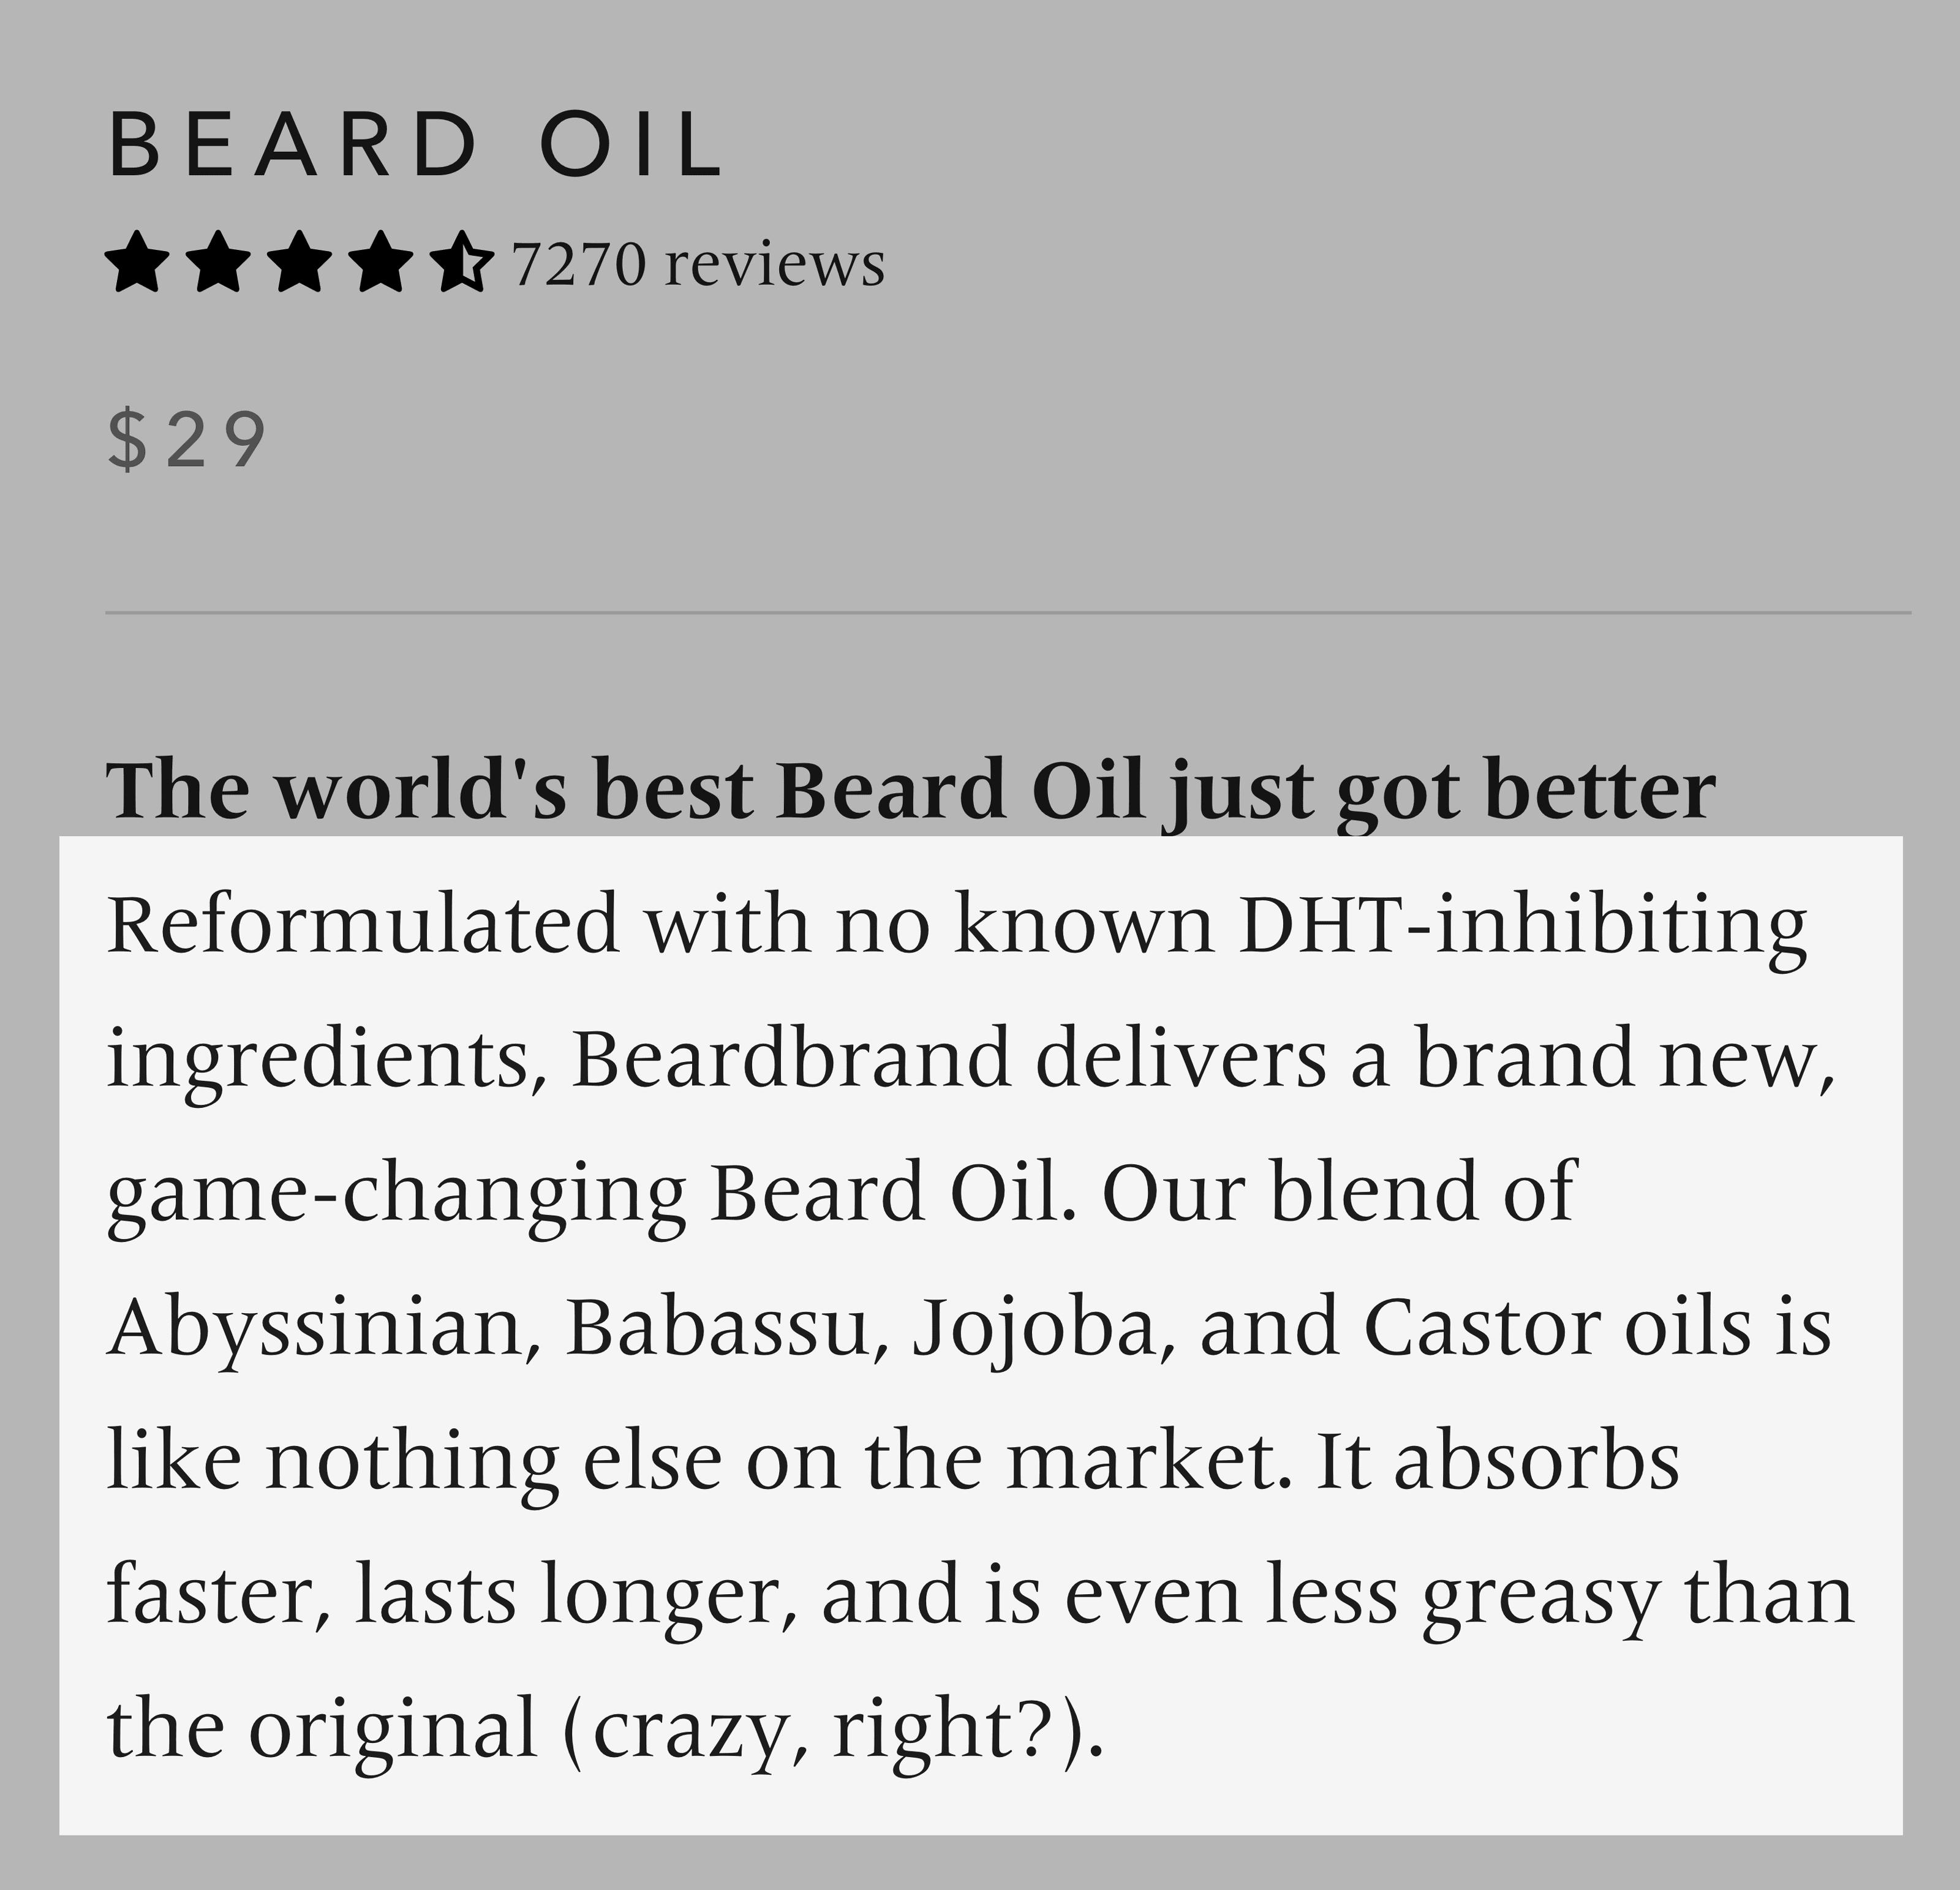 Beardbrand – Beard Oil Product Page Description